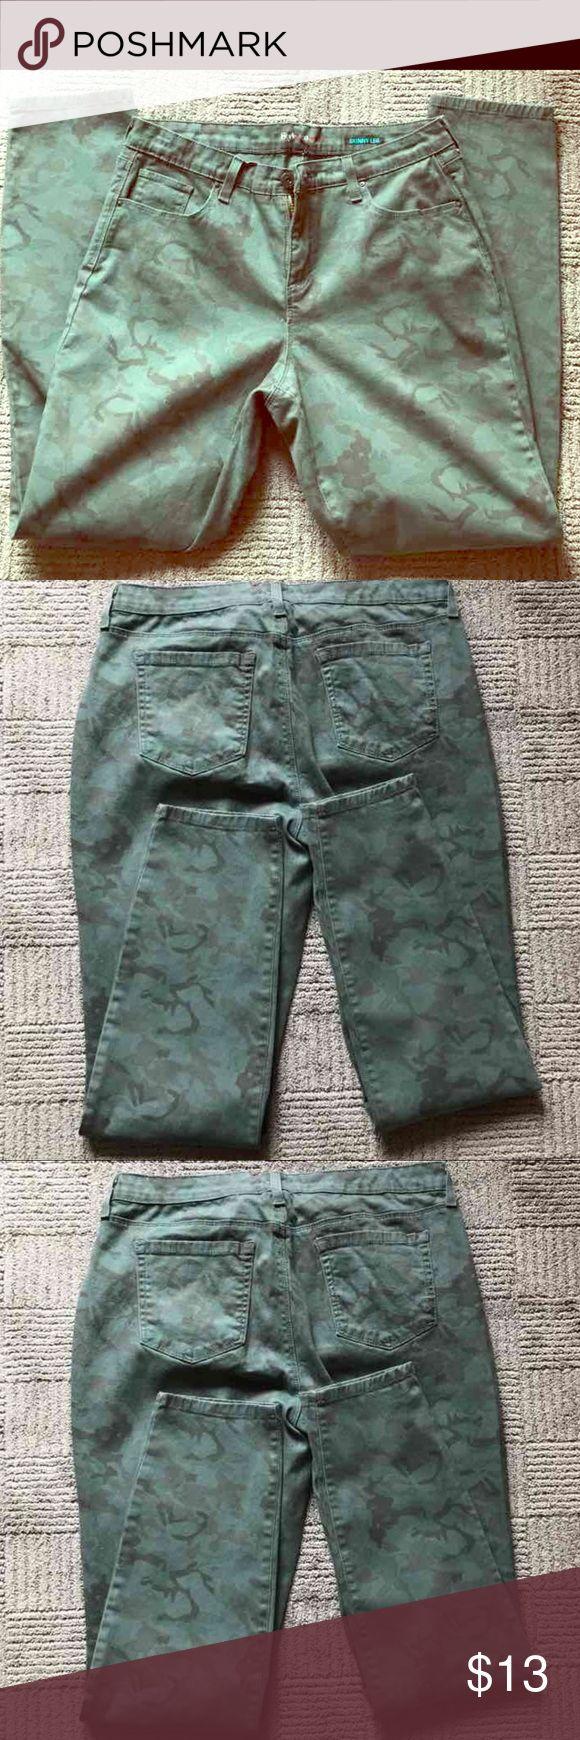 Camouflage Skinny Jeans Skinny Jeans Size 12 Jeans Skinny